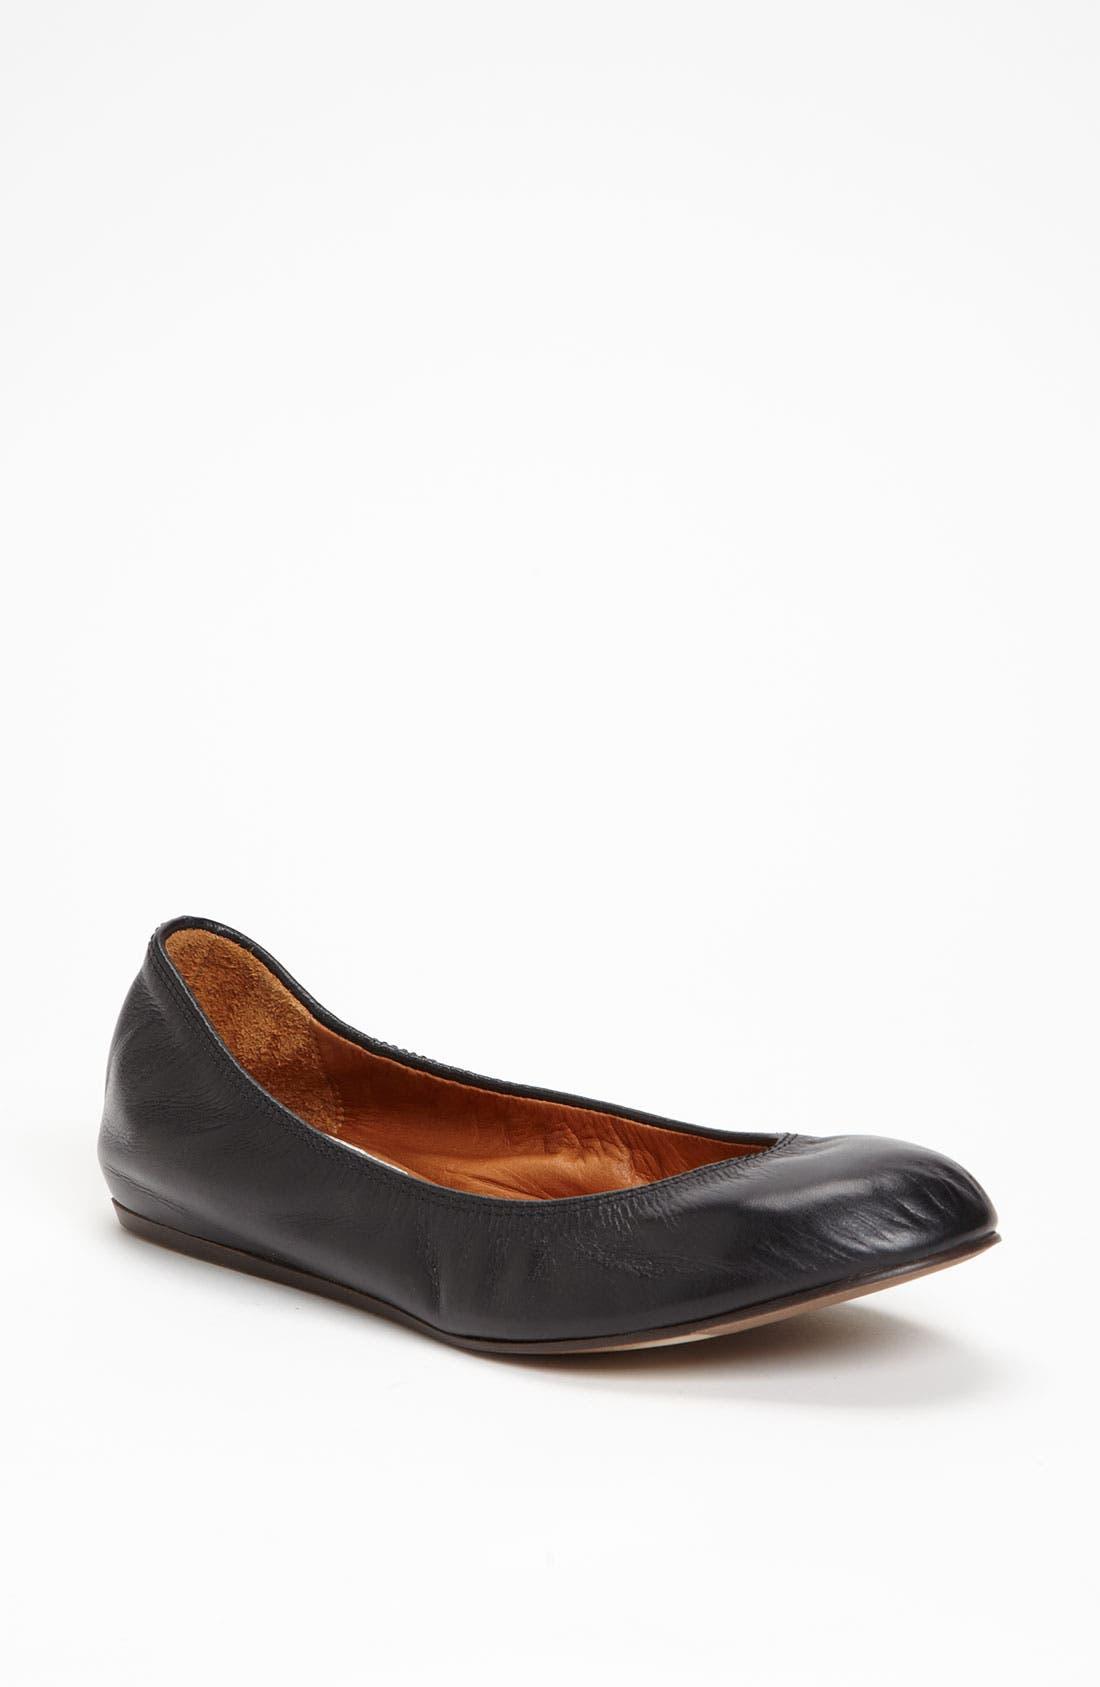 Alternate Image 1 Selected - Lanvin Leather Ballerina Flat